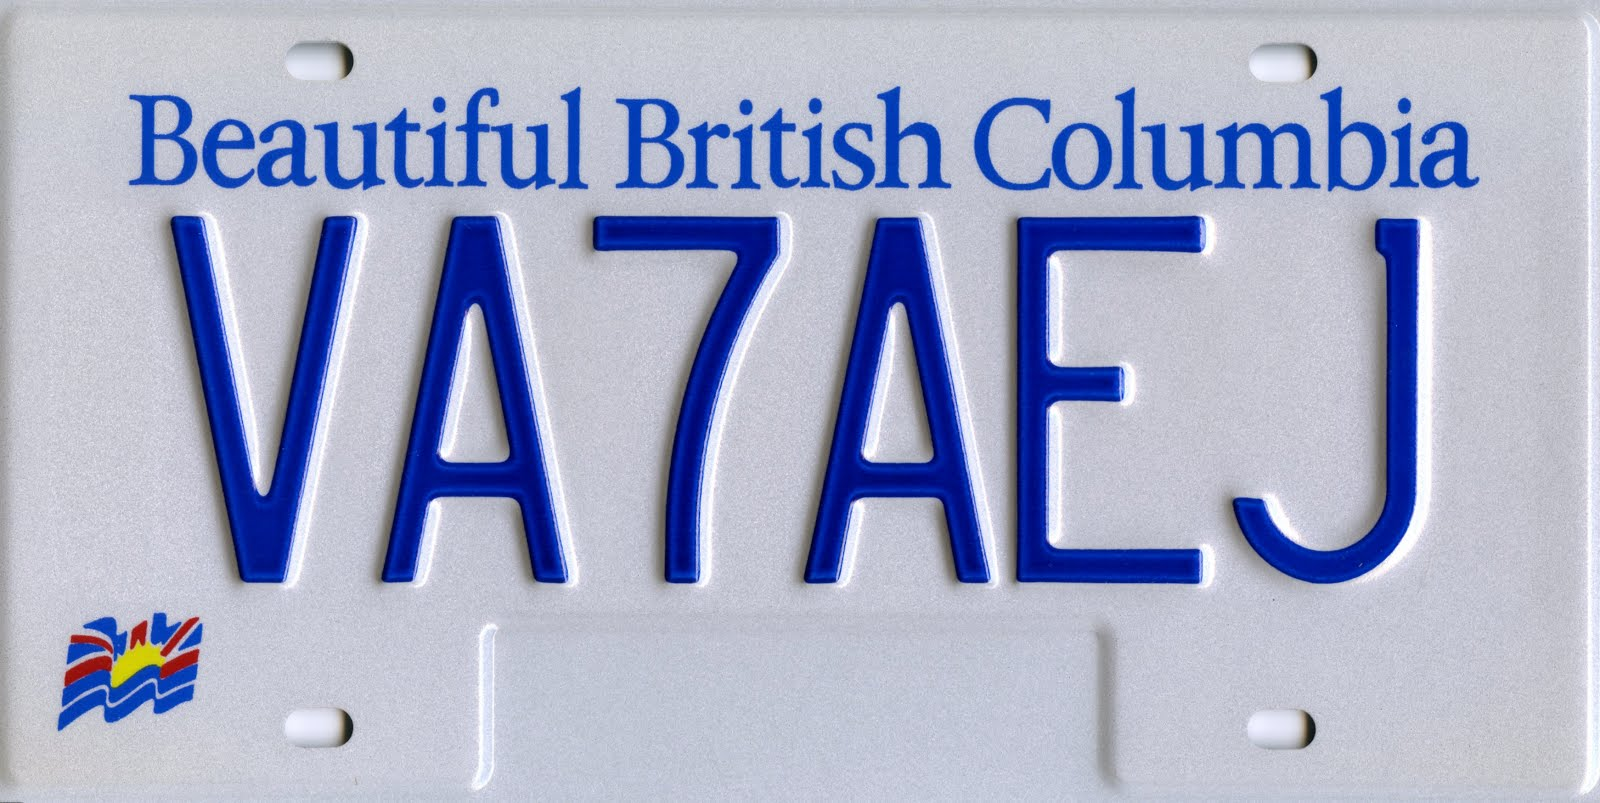 BC Ham Radio License Plate